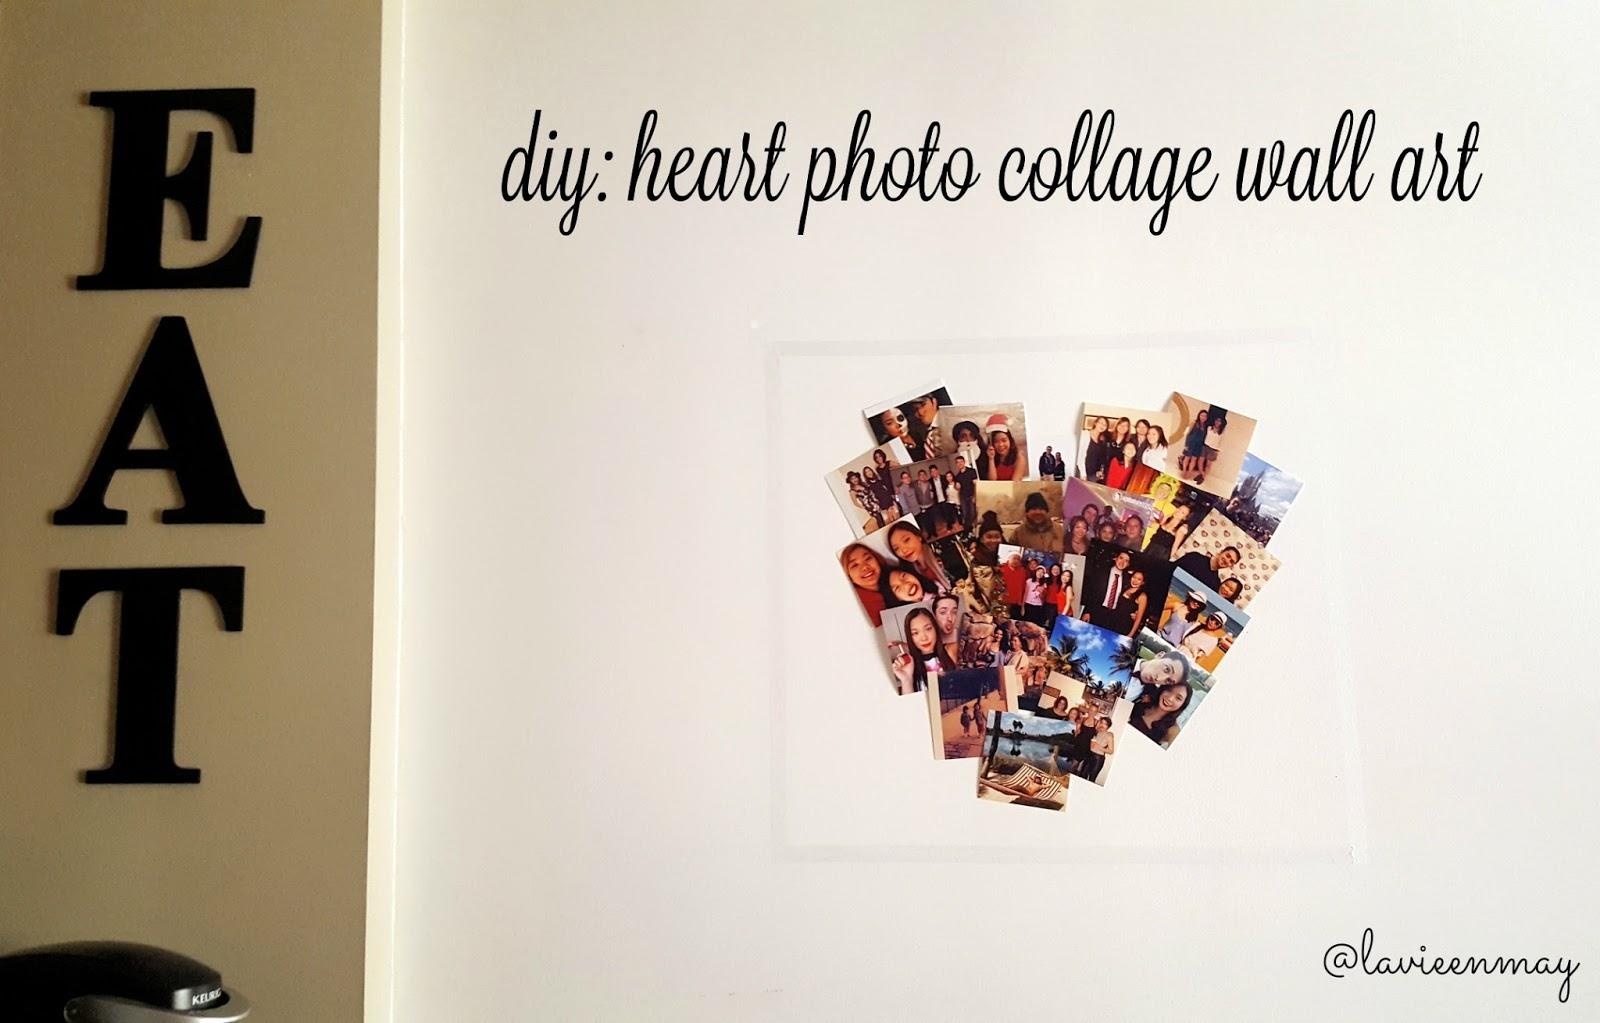 Diy Heart Photo Collage Wall Art La Vie En May Petite